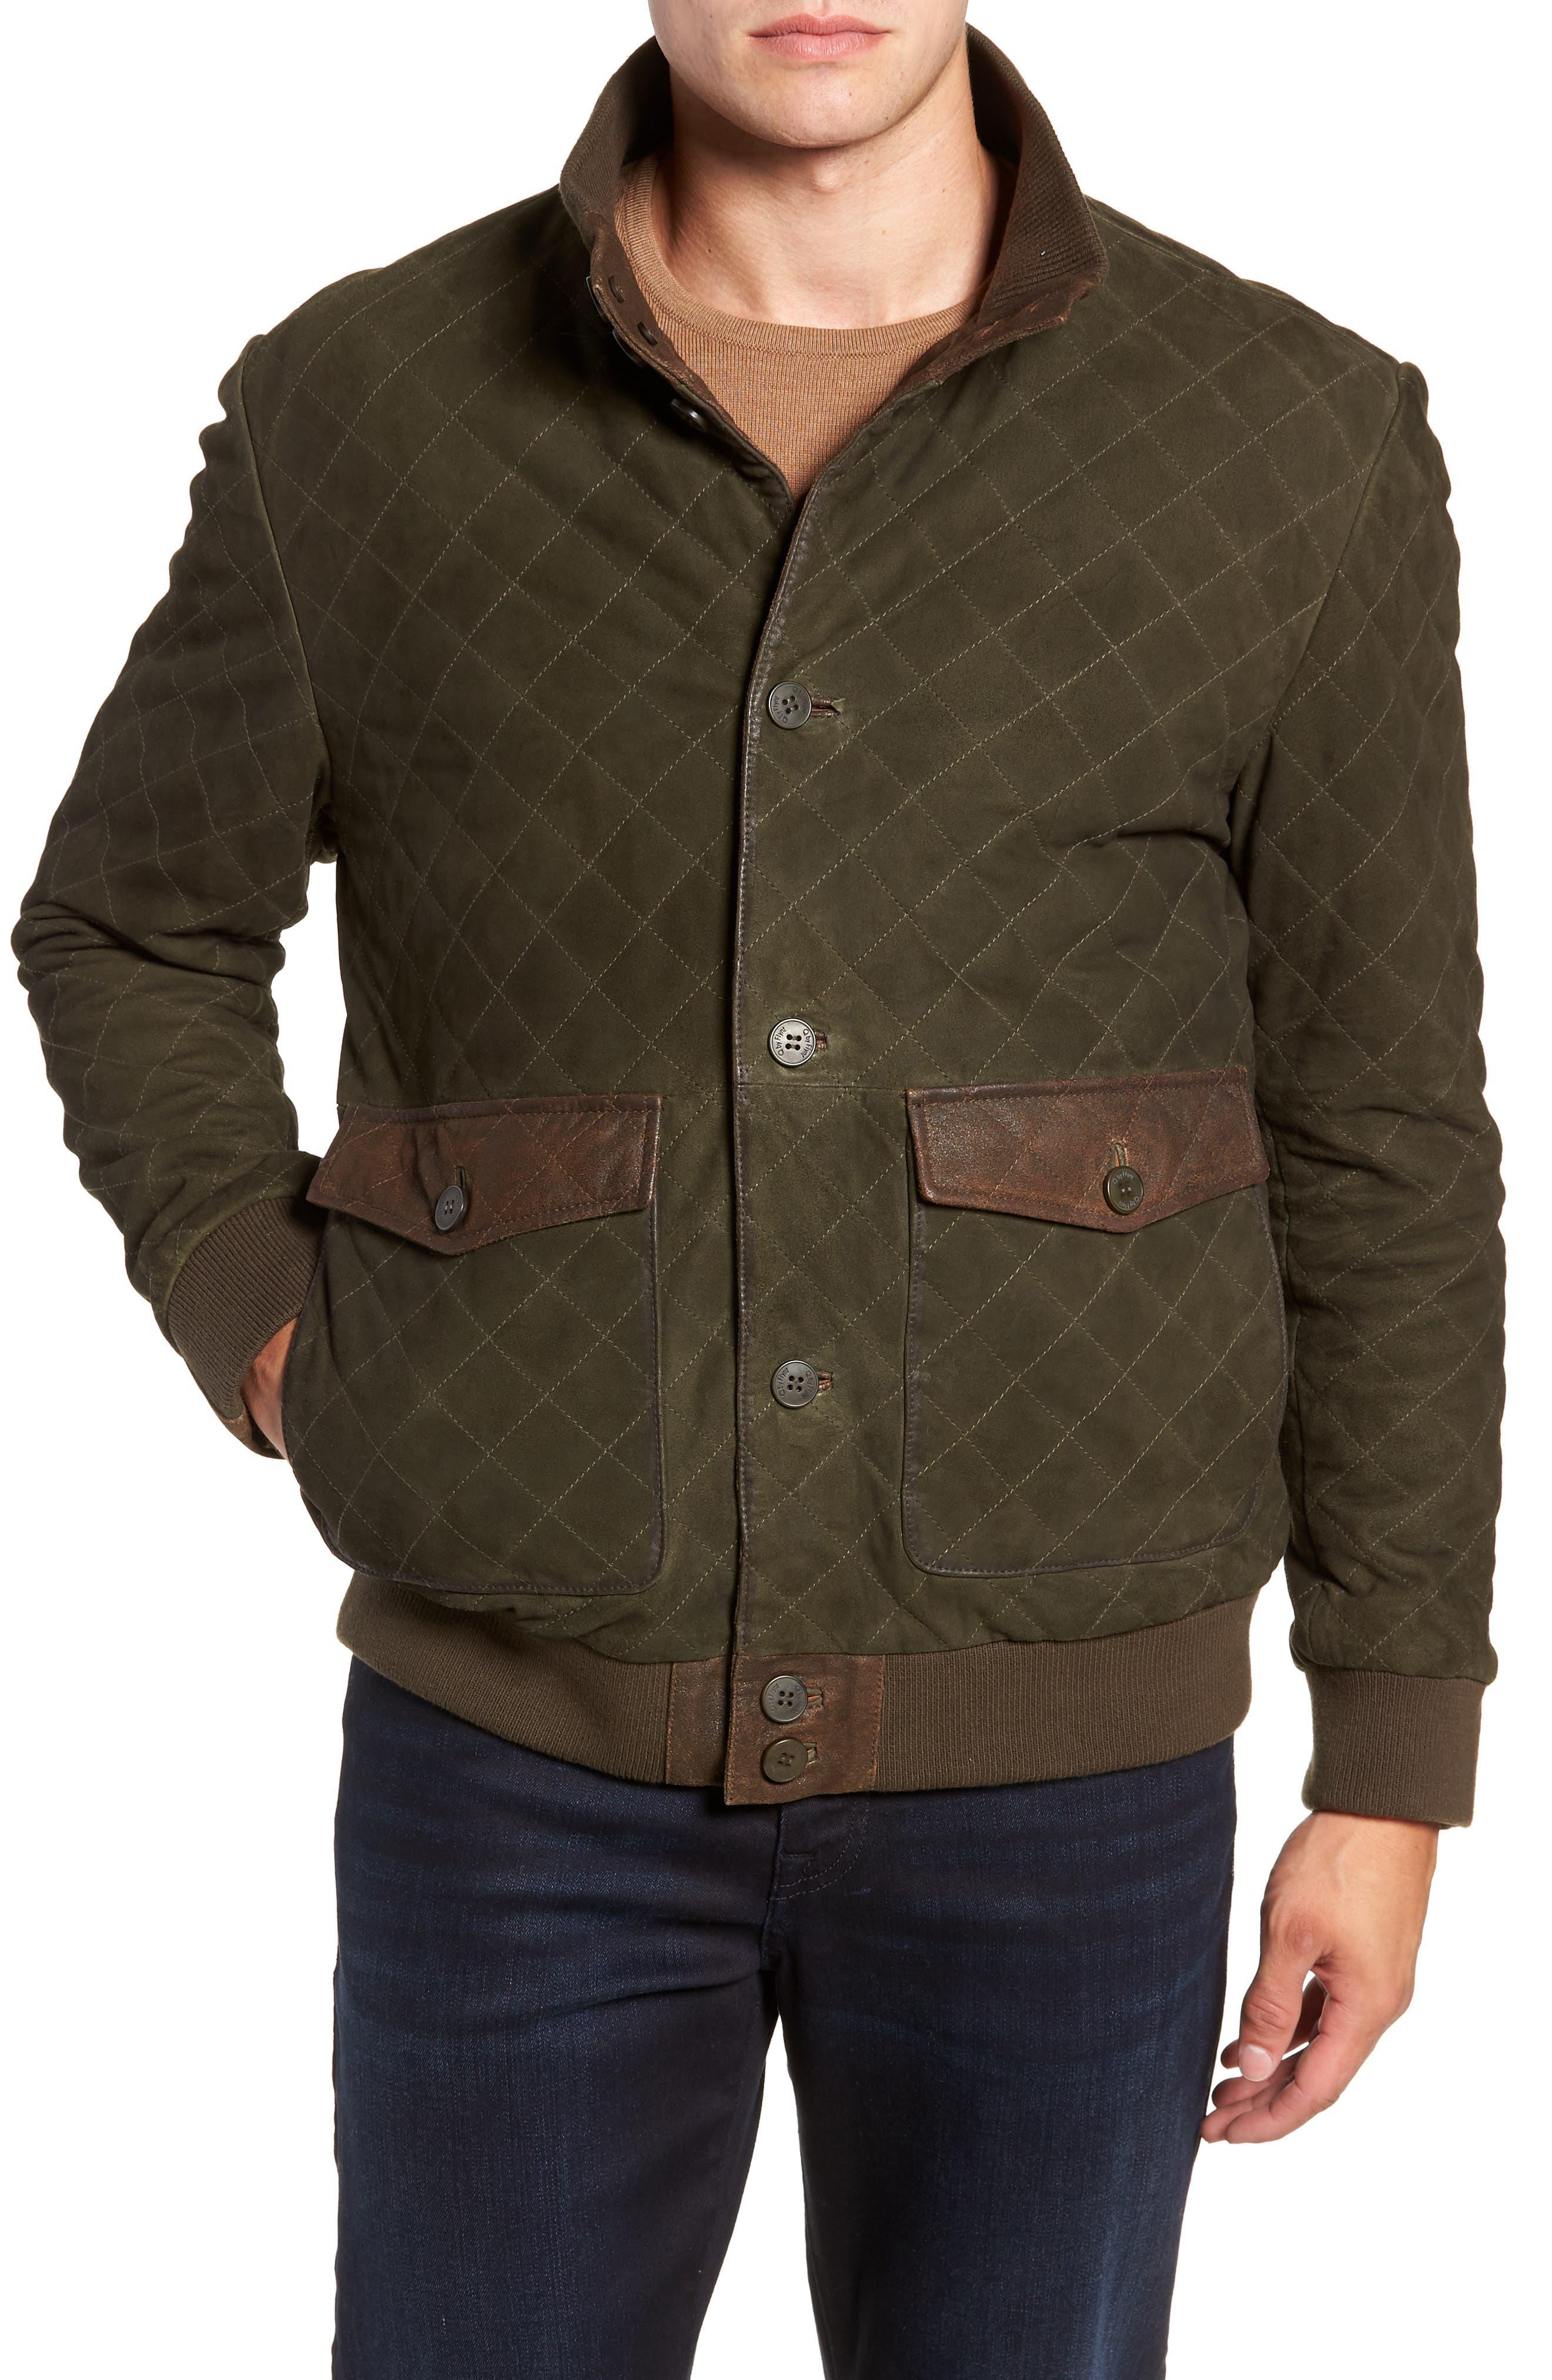 Regular Fit Quilted Suede Jacket,                             Alternate thumbnail 4, color,                             OLIVE